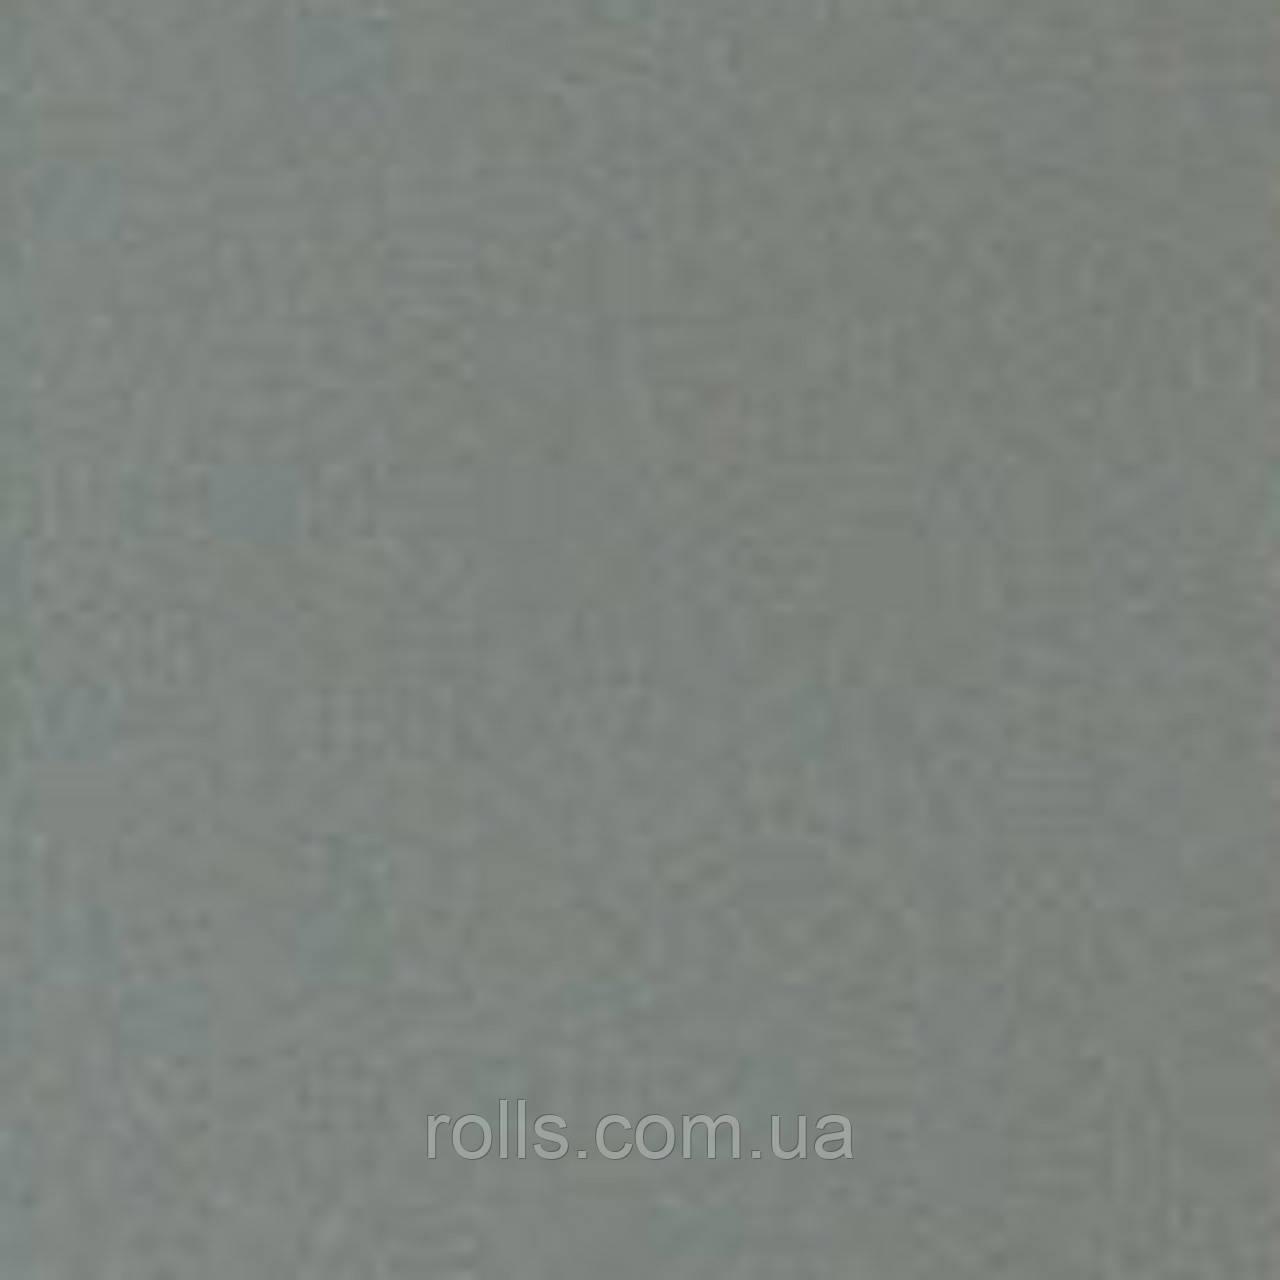 "Лист плоский алюминиевый Prefalz PP99 №47 PATINA GRAU ""Патинированый титан-цинк серый"" 0,7х1000х2000мм"